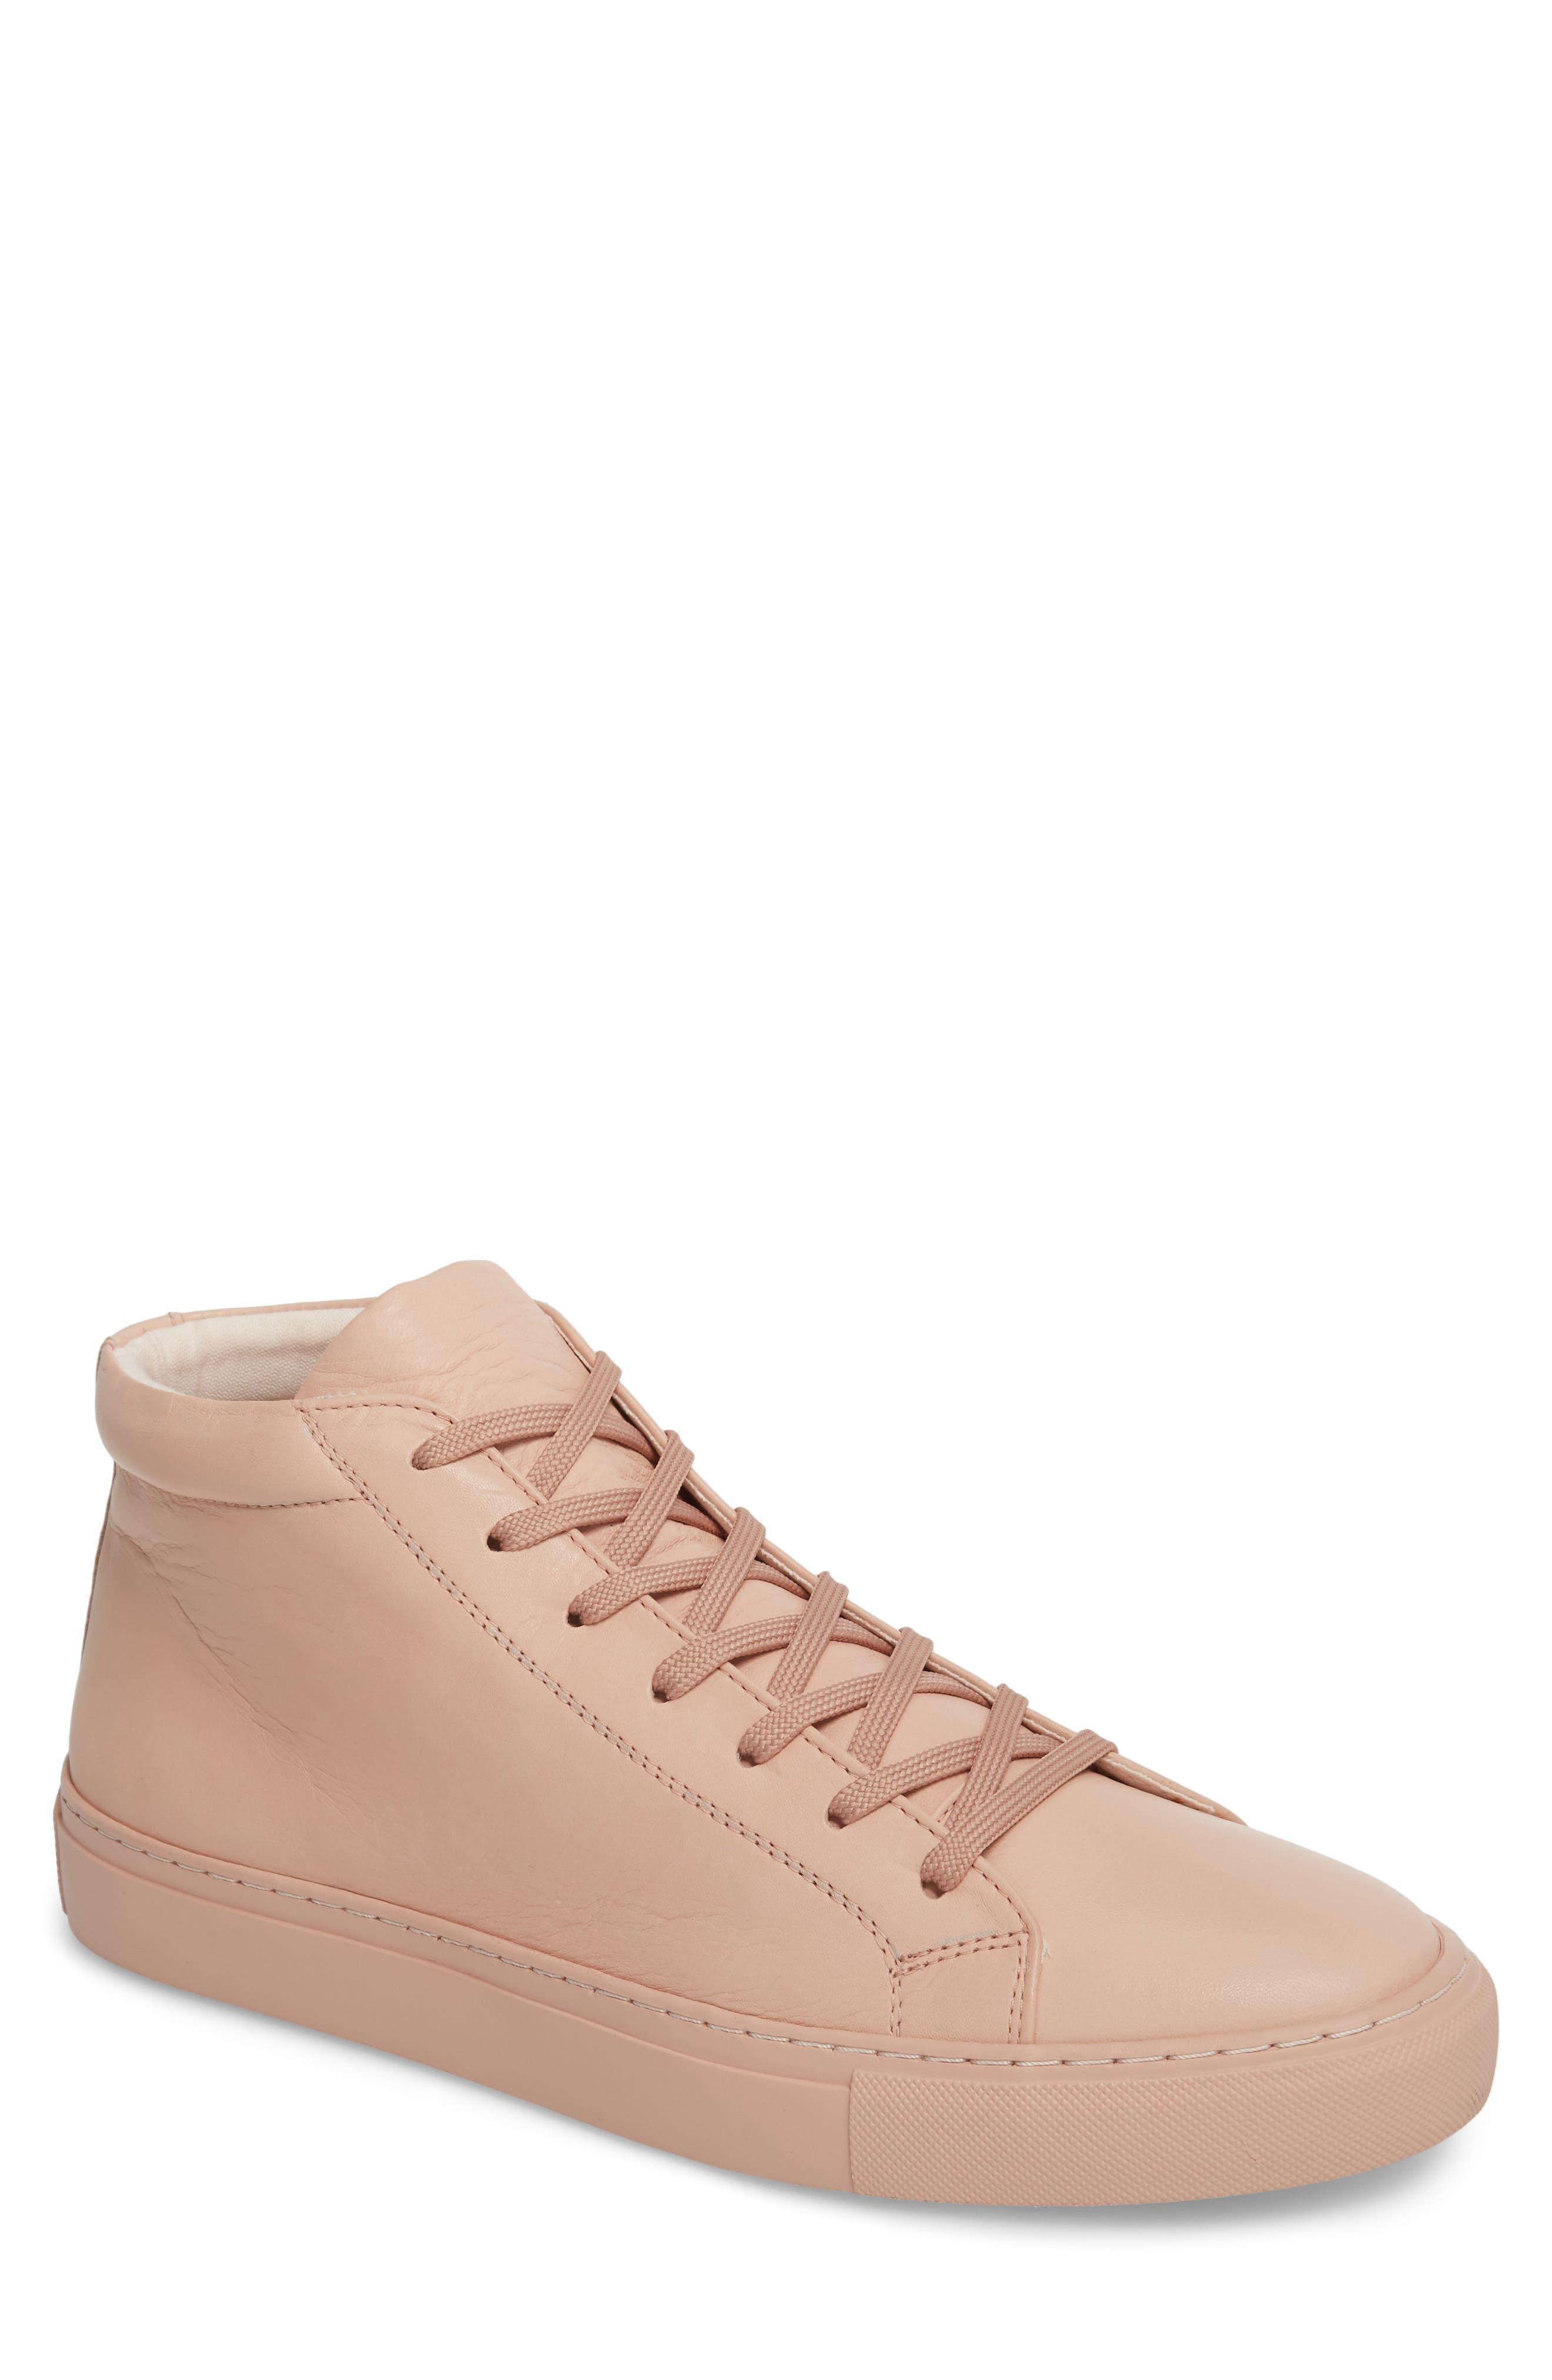 Lexington Mid Top Sneaker,                             Main thumbnail 3, color,